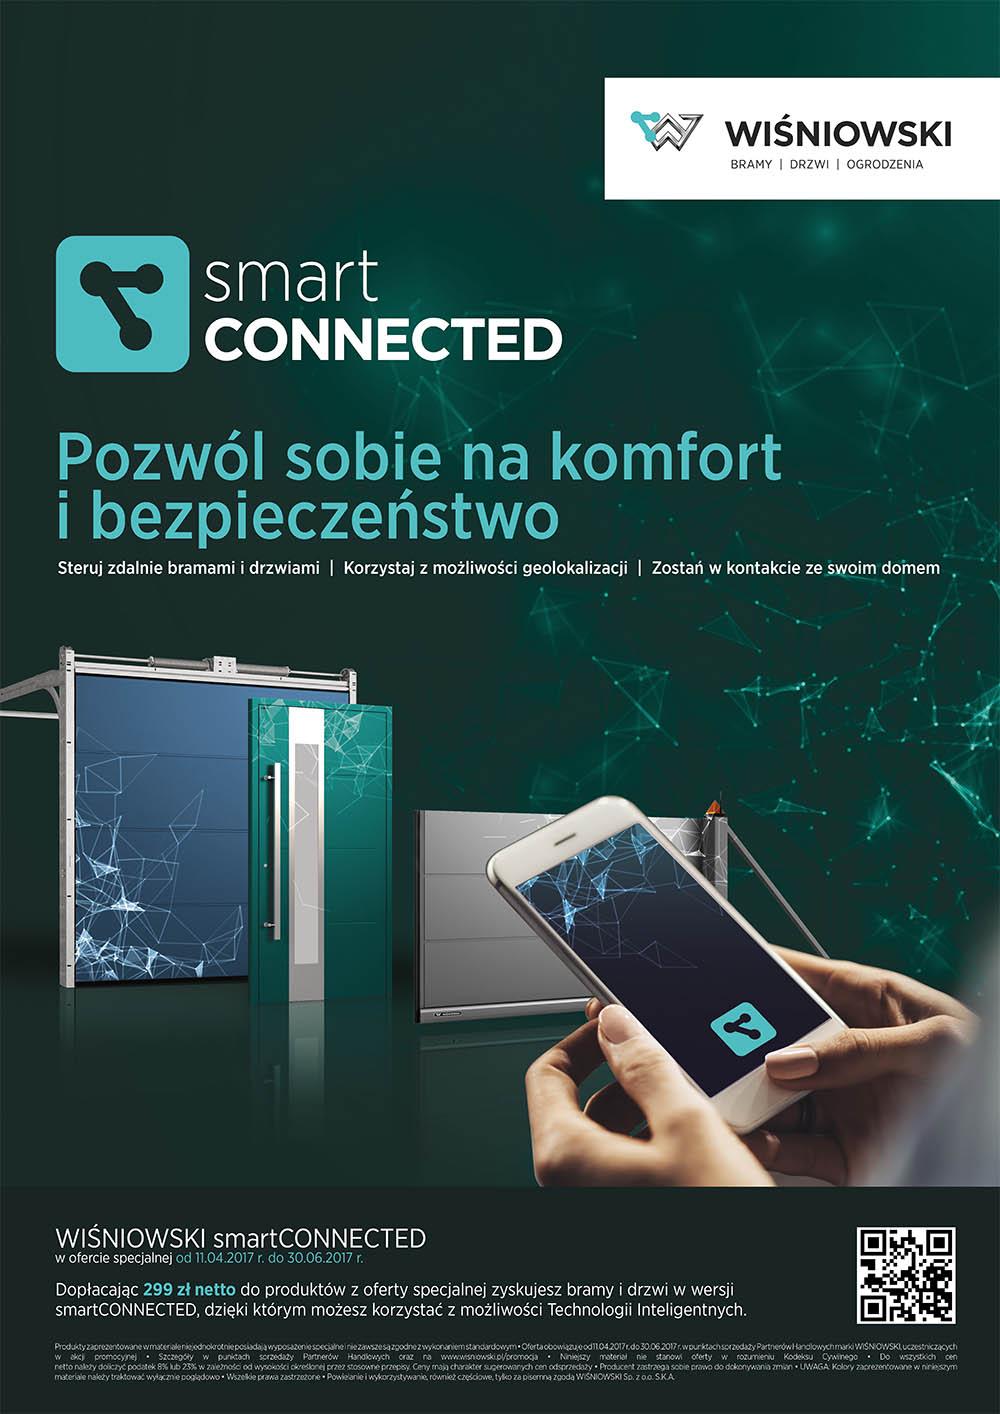 promocja Wiśniowski smartConnected